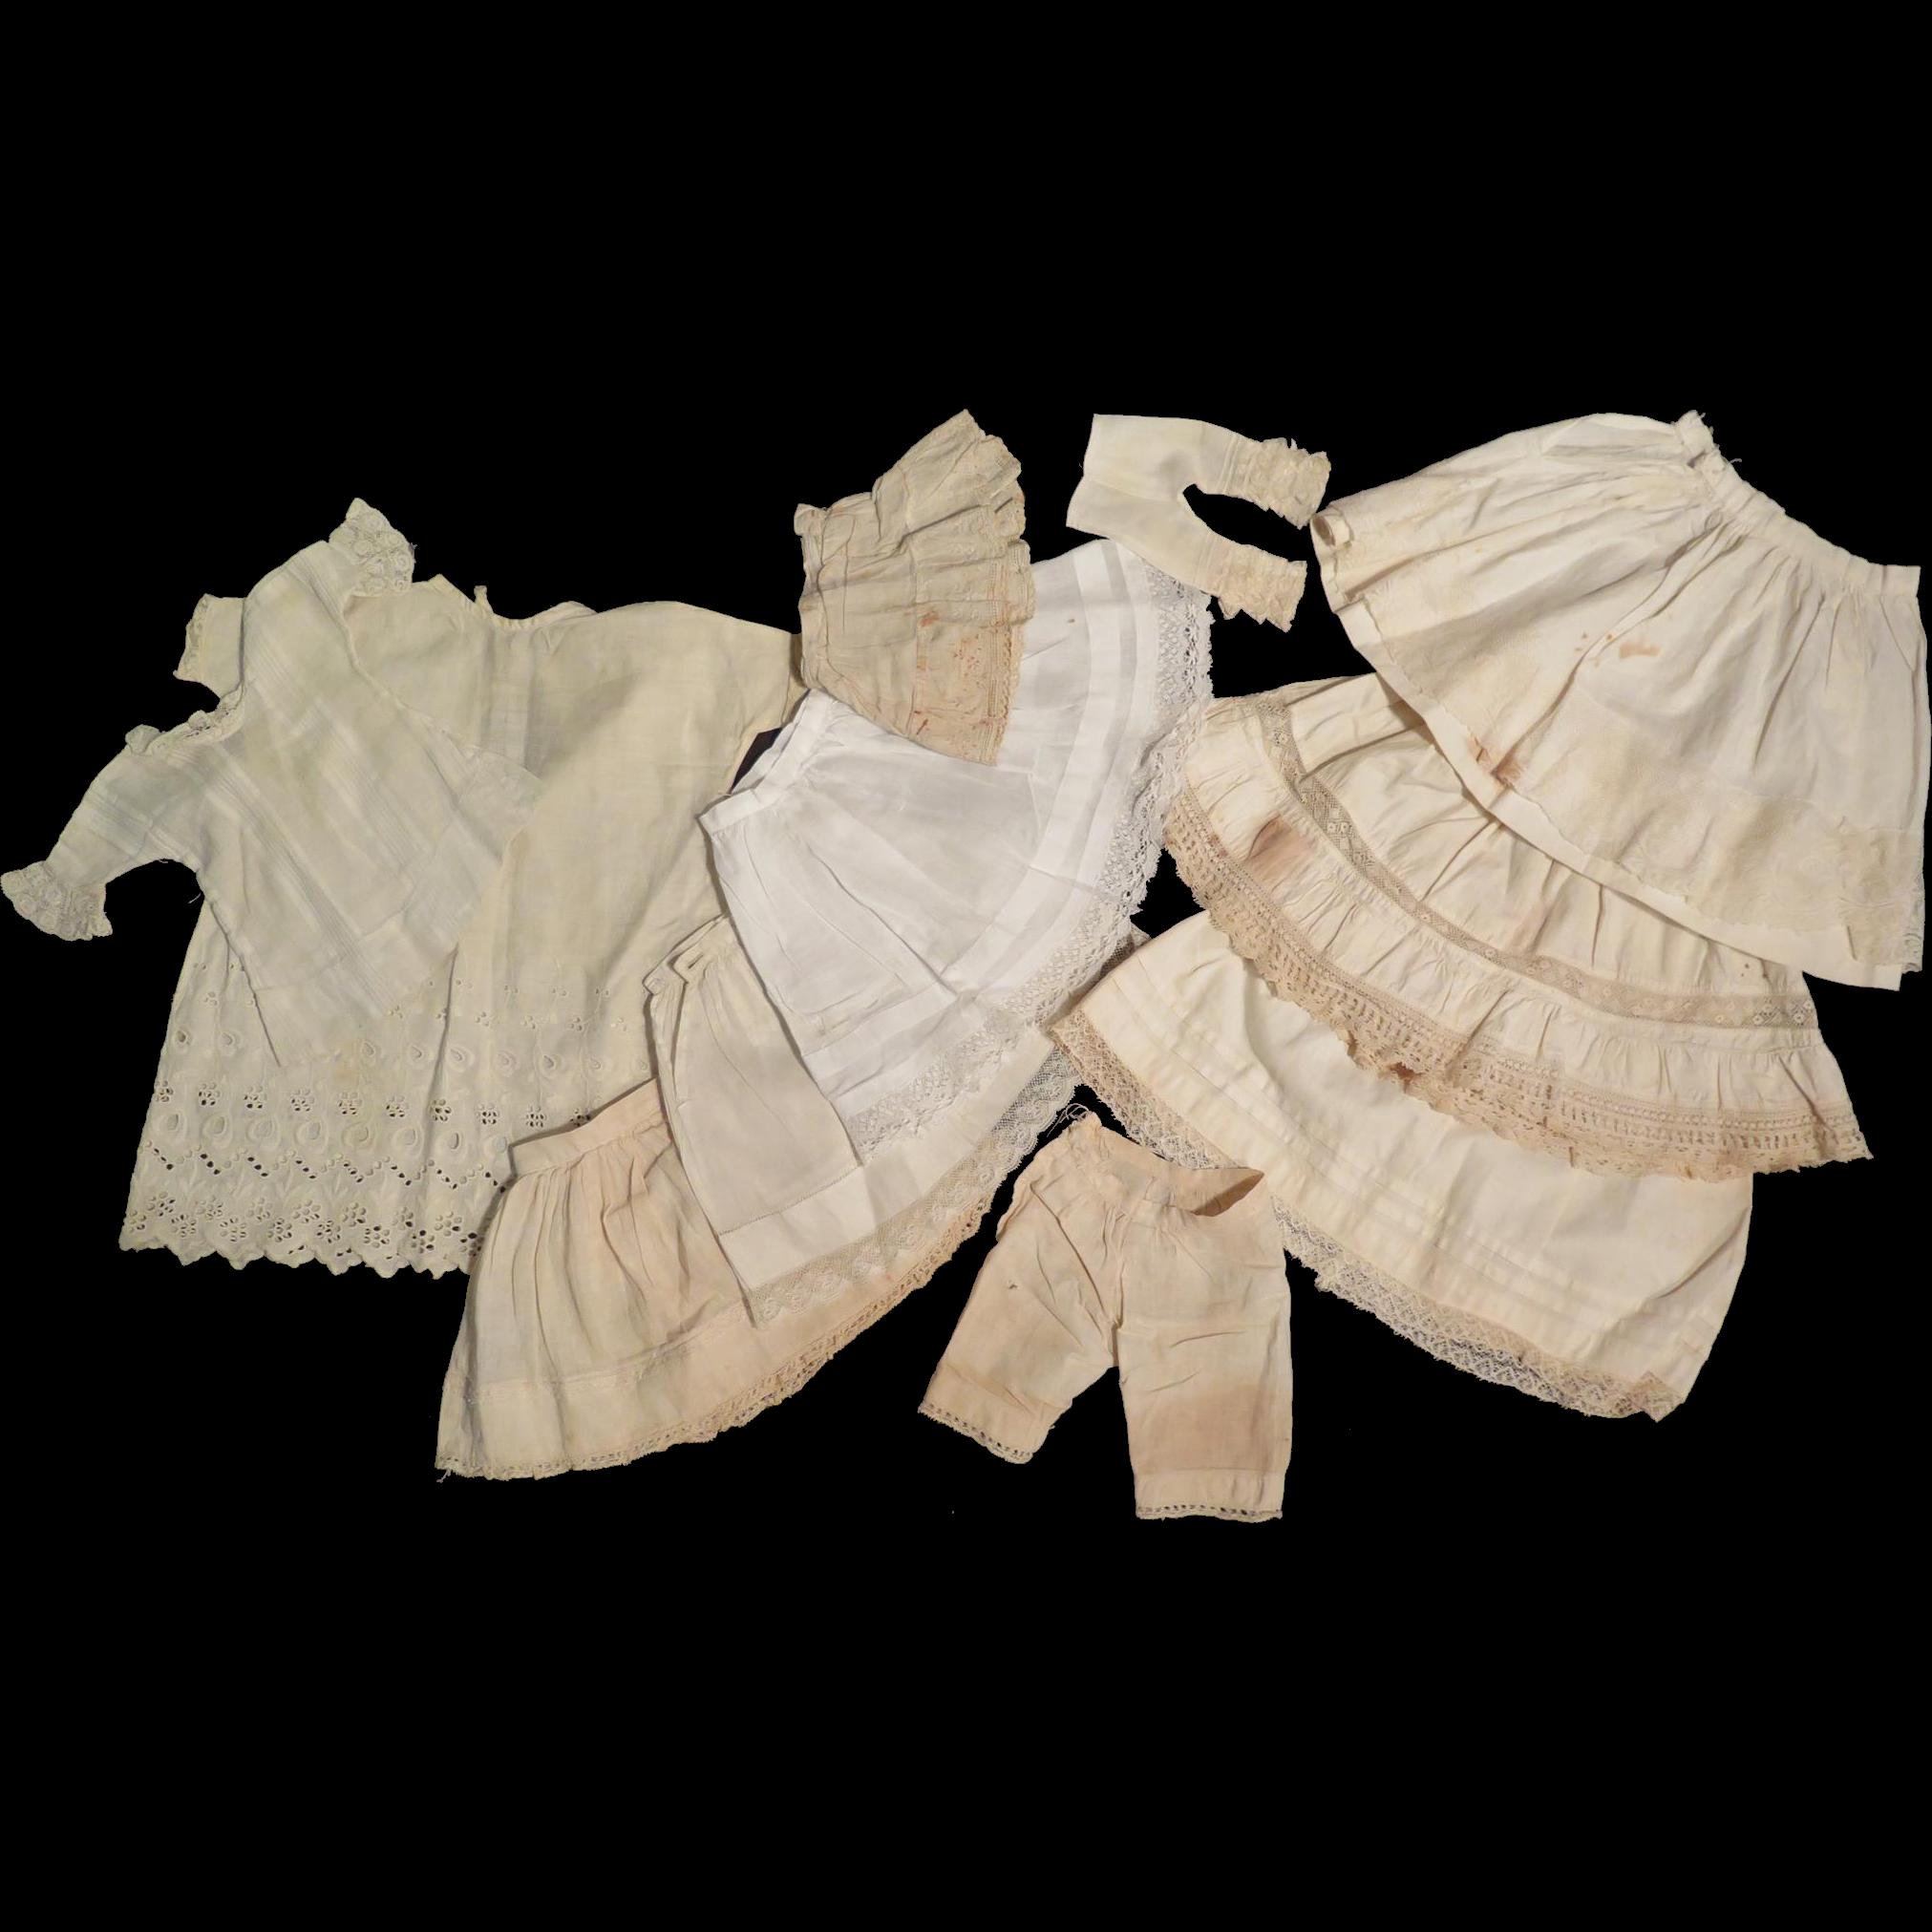 11 pc Lot Antique Doll White Petticoats, Chemise, Pantaloons